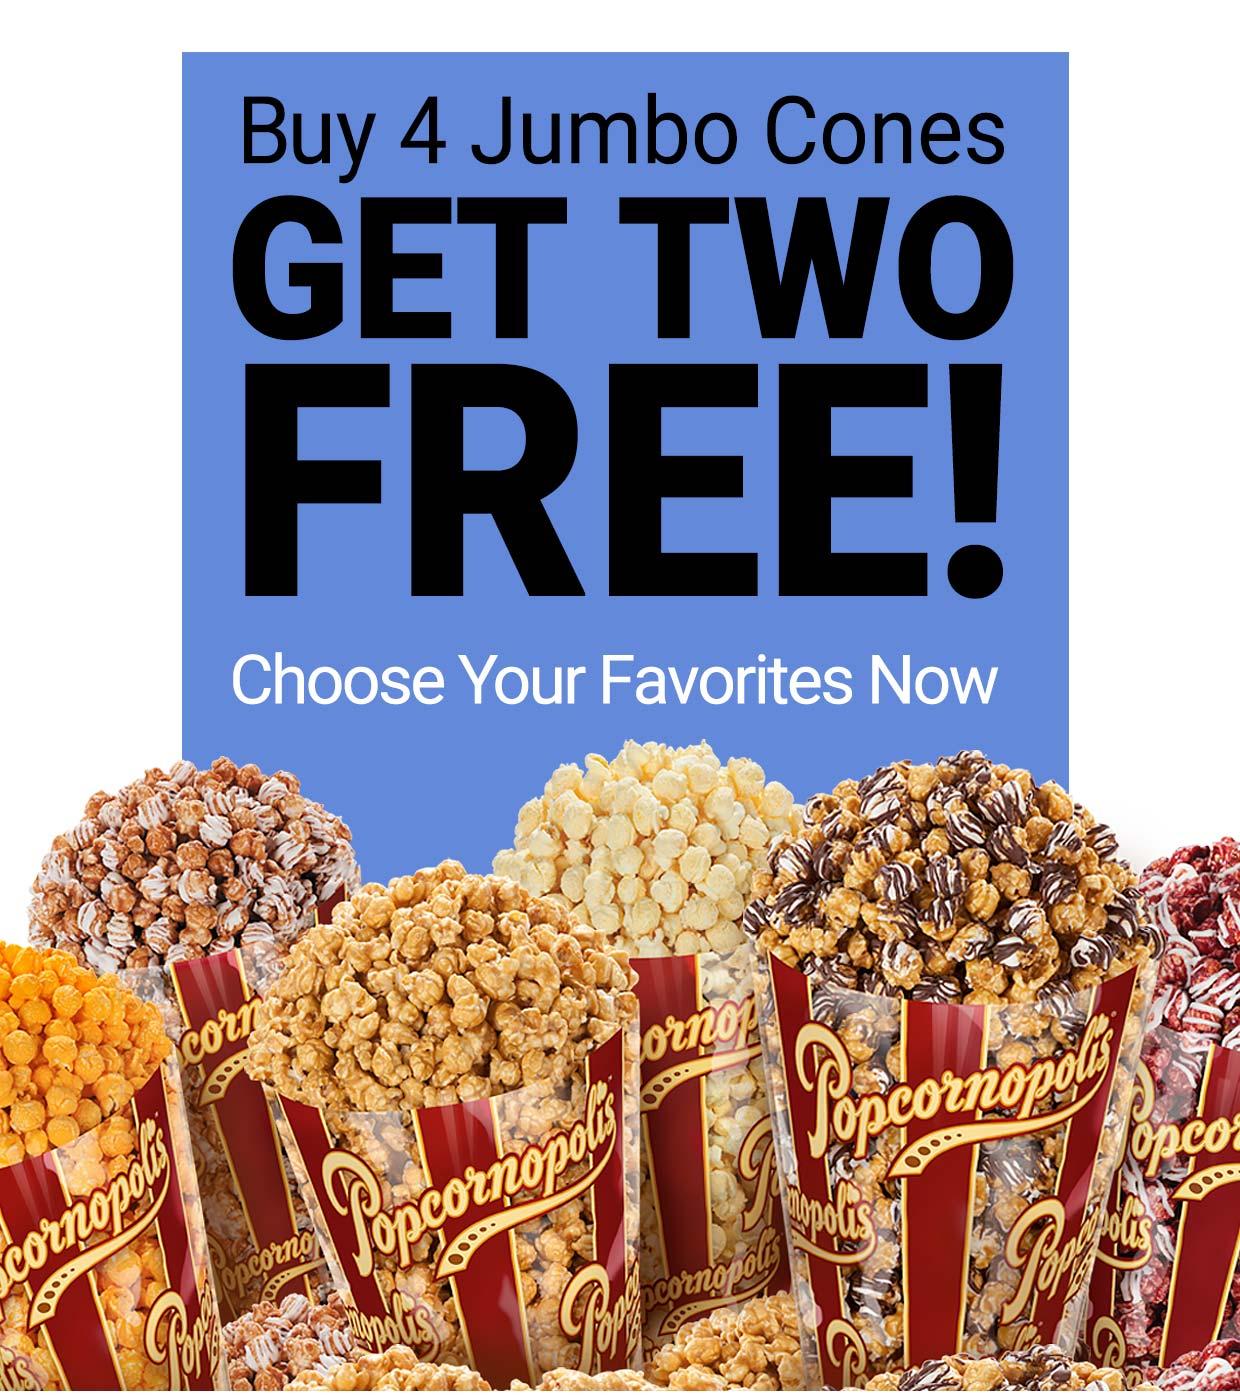 Popcornopolis Sale: Buy 4, Get 2 FREE!